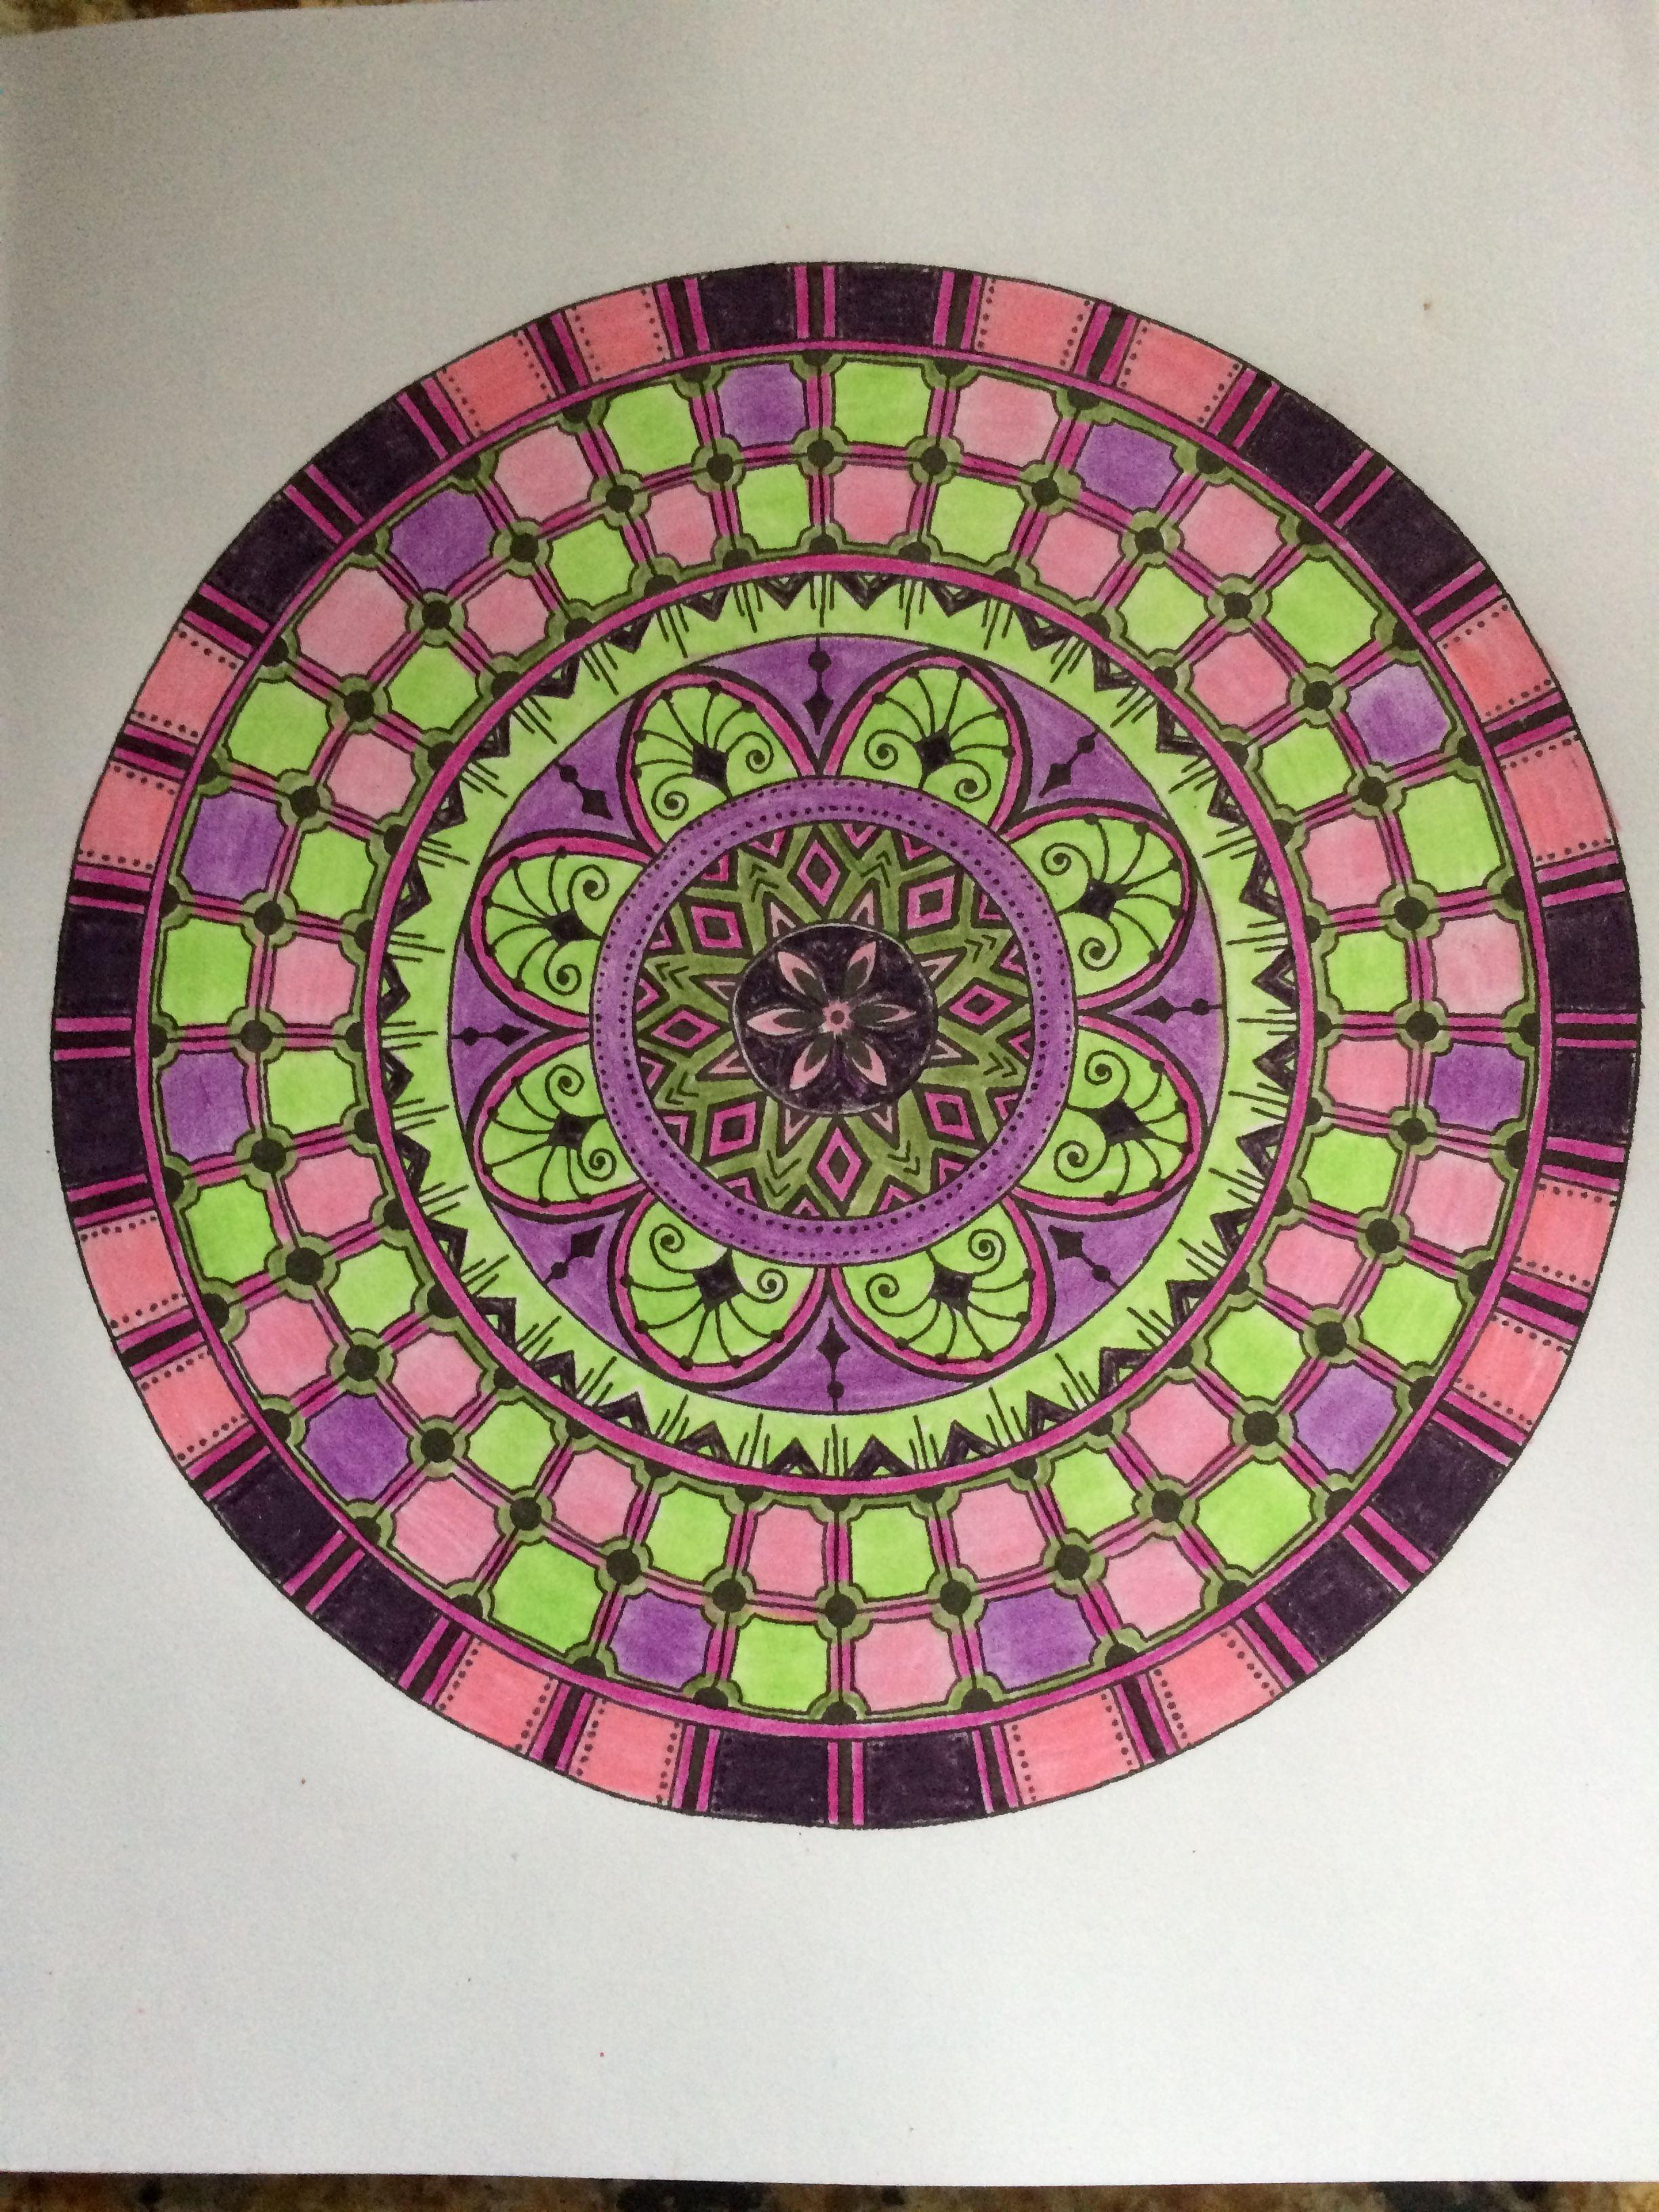 Zendoodle coloring enchanting gardens - Zendoodles Coloring By Nancy Chard